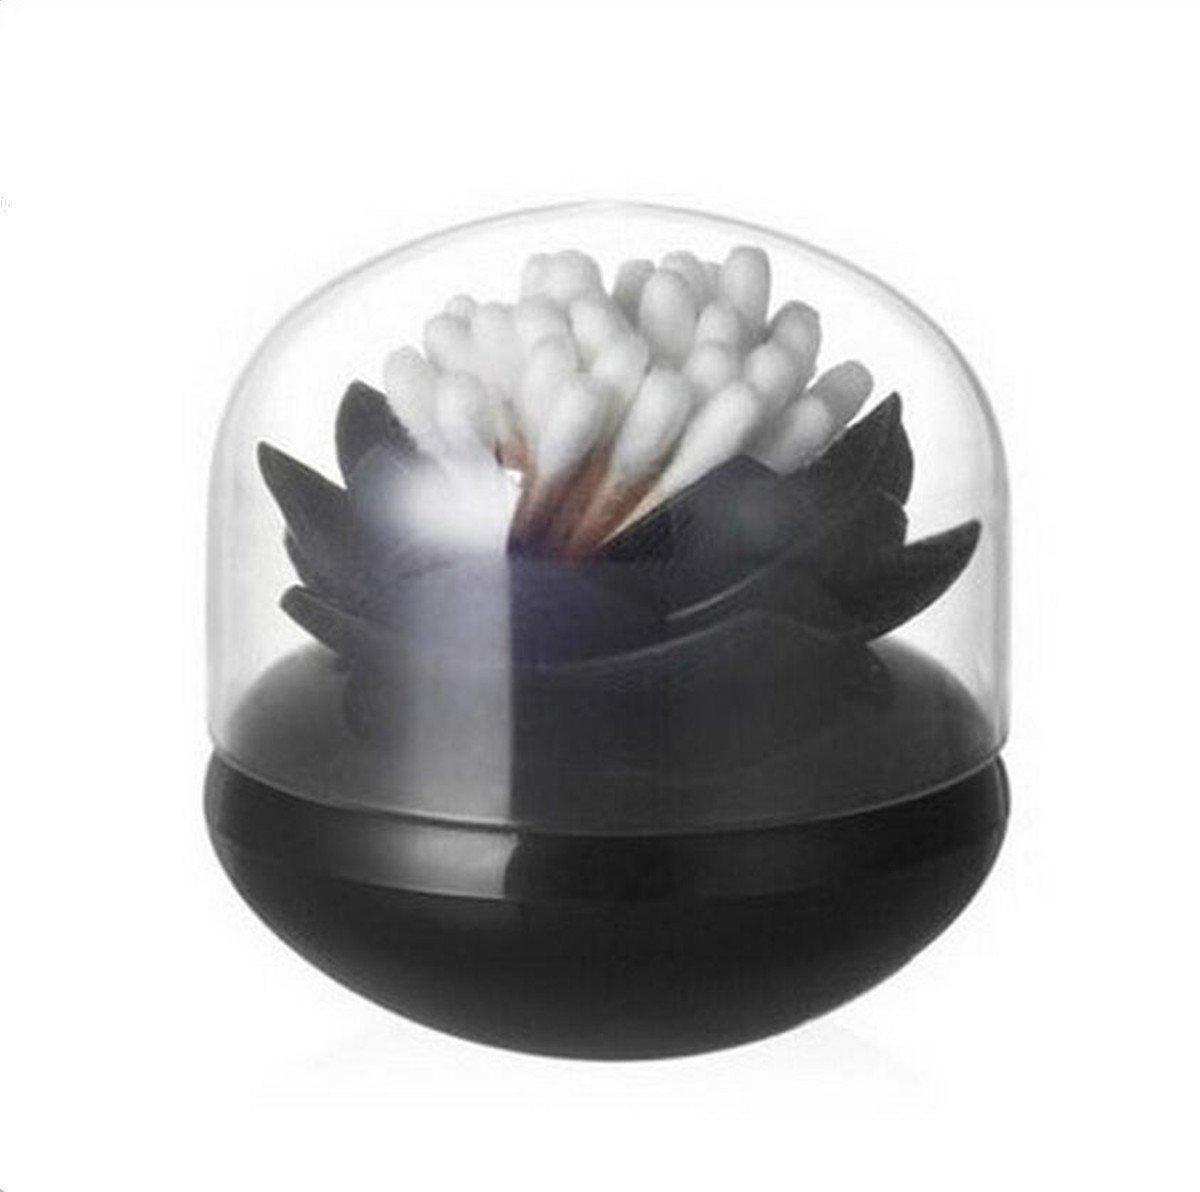 Bloss Cute Lotus Cotton Swab Holder Q-tips Storage Organizer Bathroom Decorative Organizer, Black